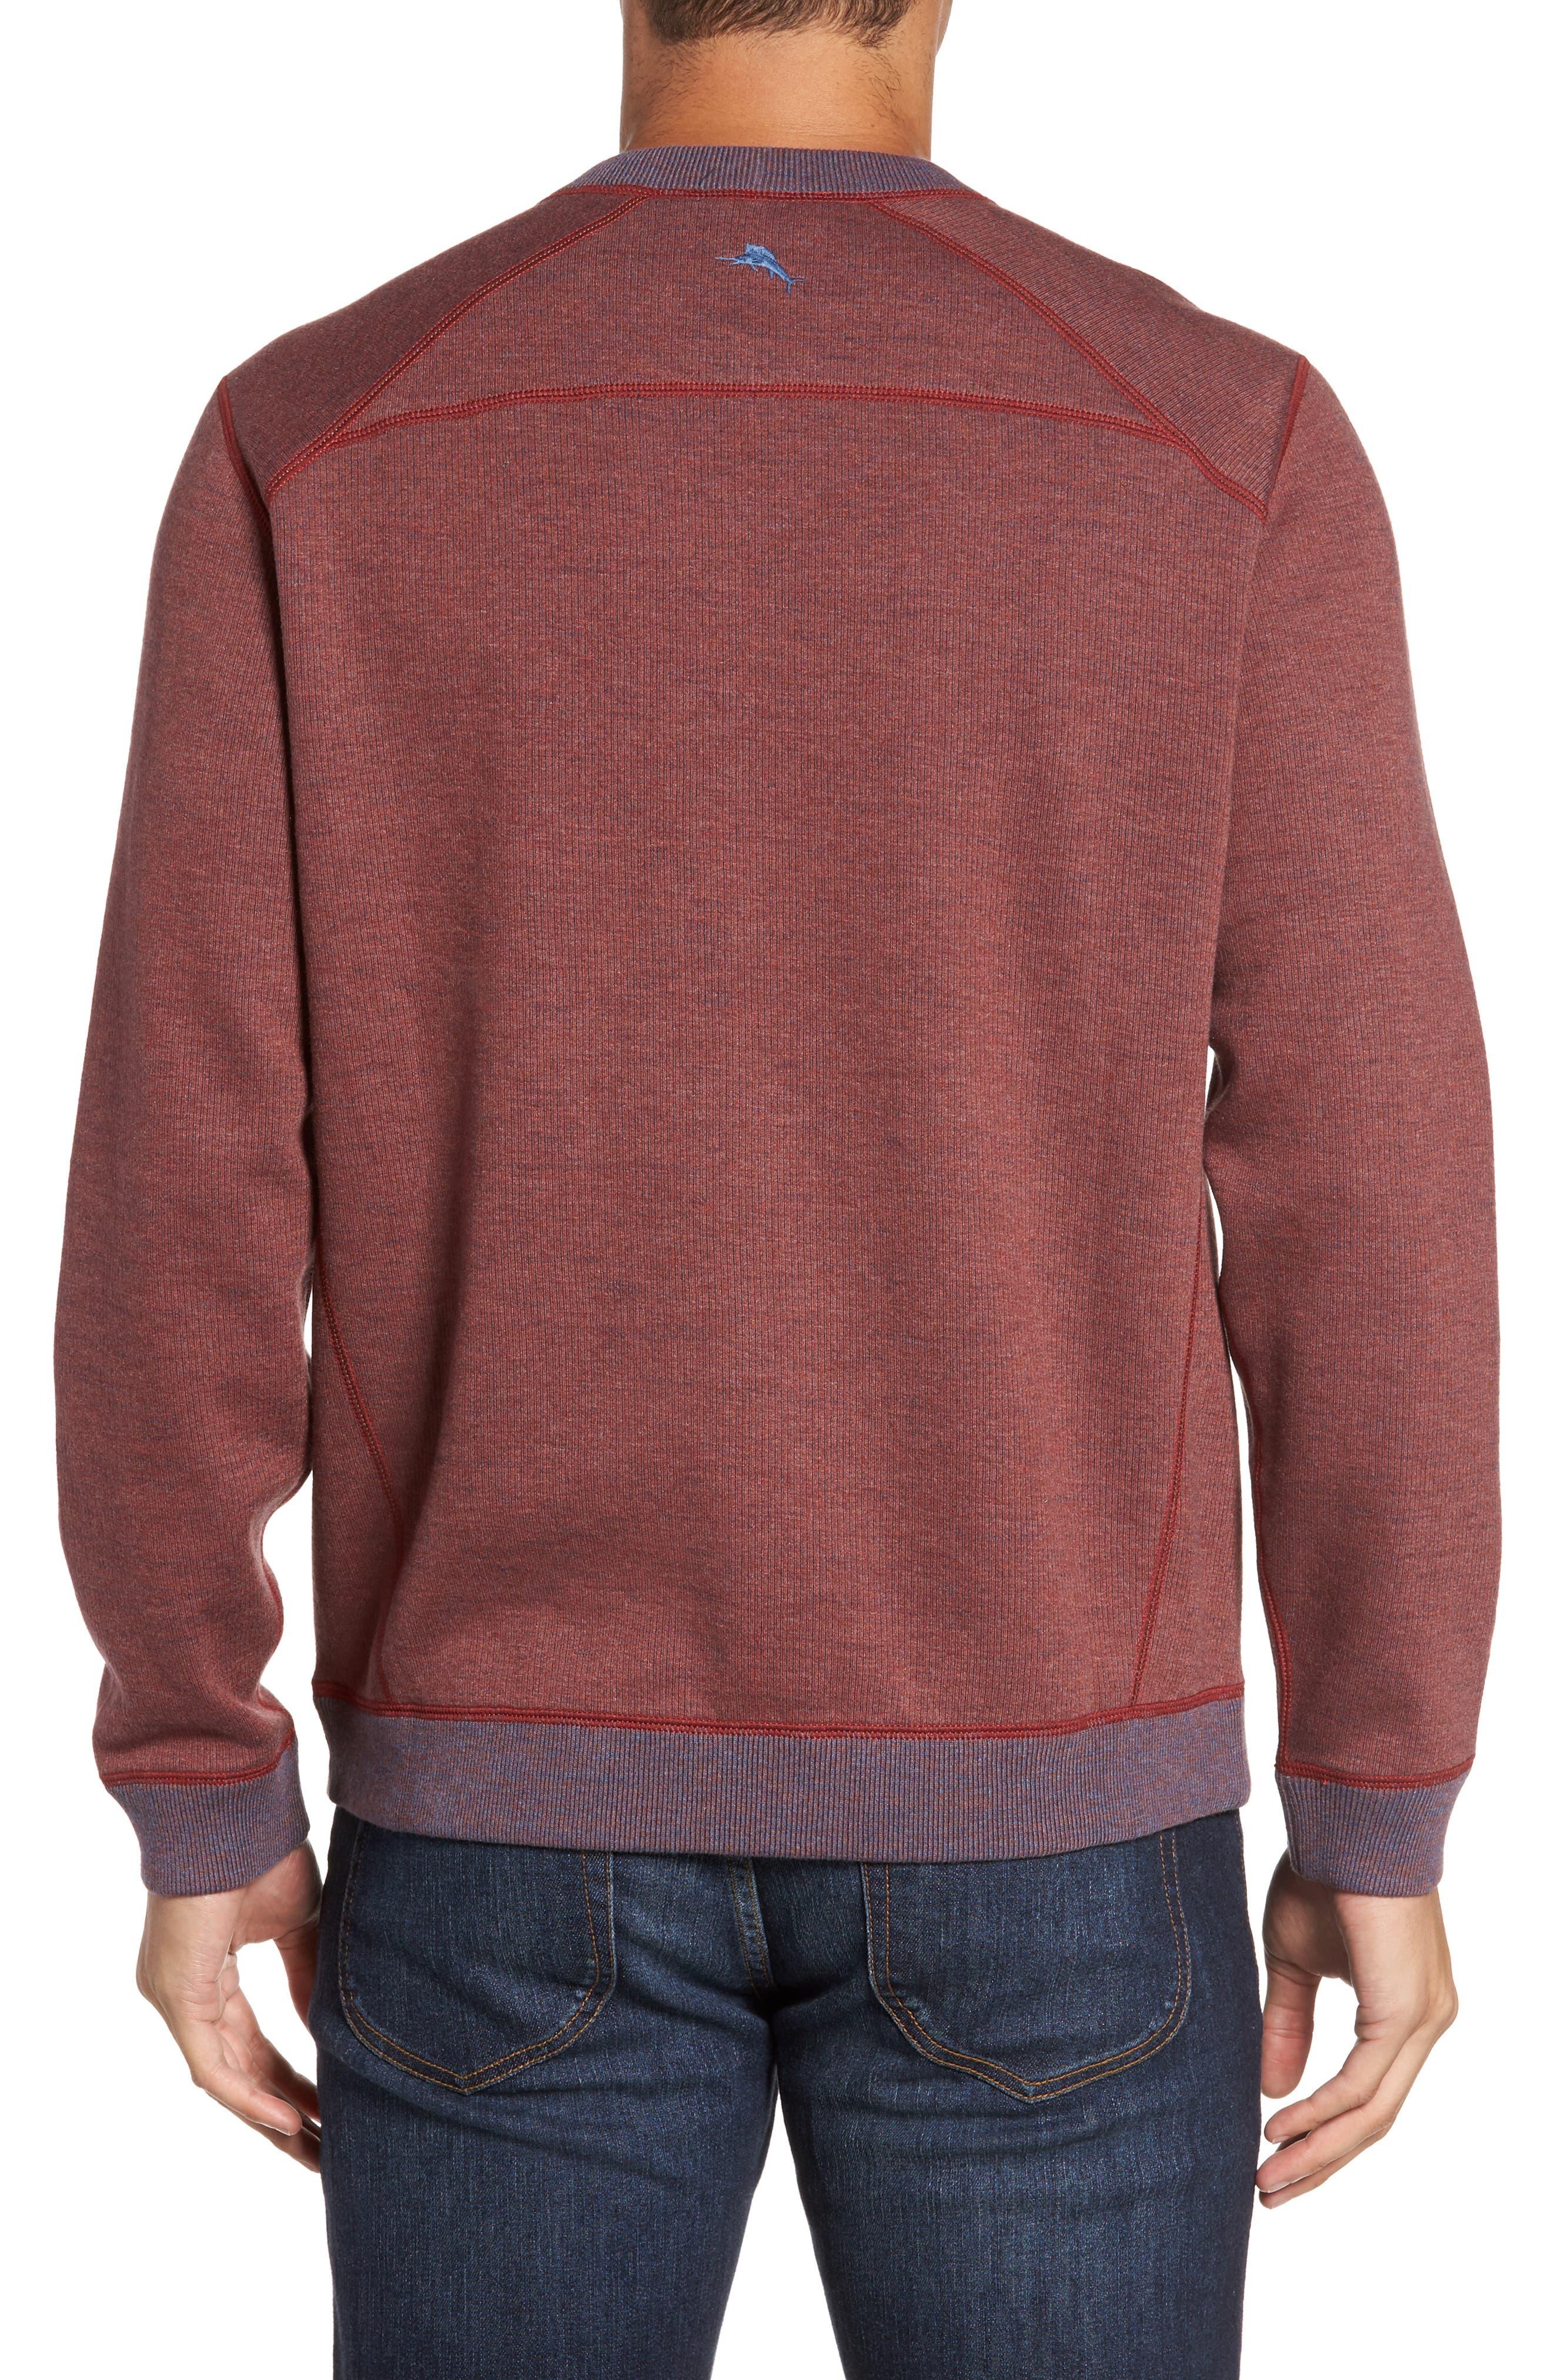 Flipside Pro Reversible Sweatshirt,                             Alternate thumbnail 2, color,                             Pompeya Heather